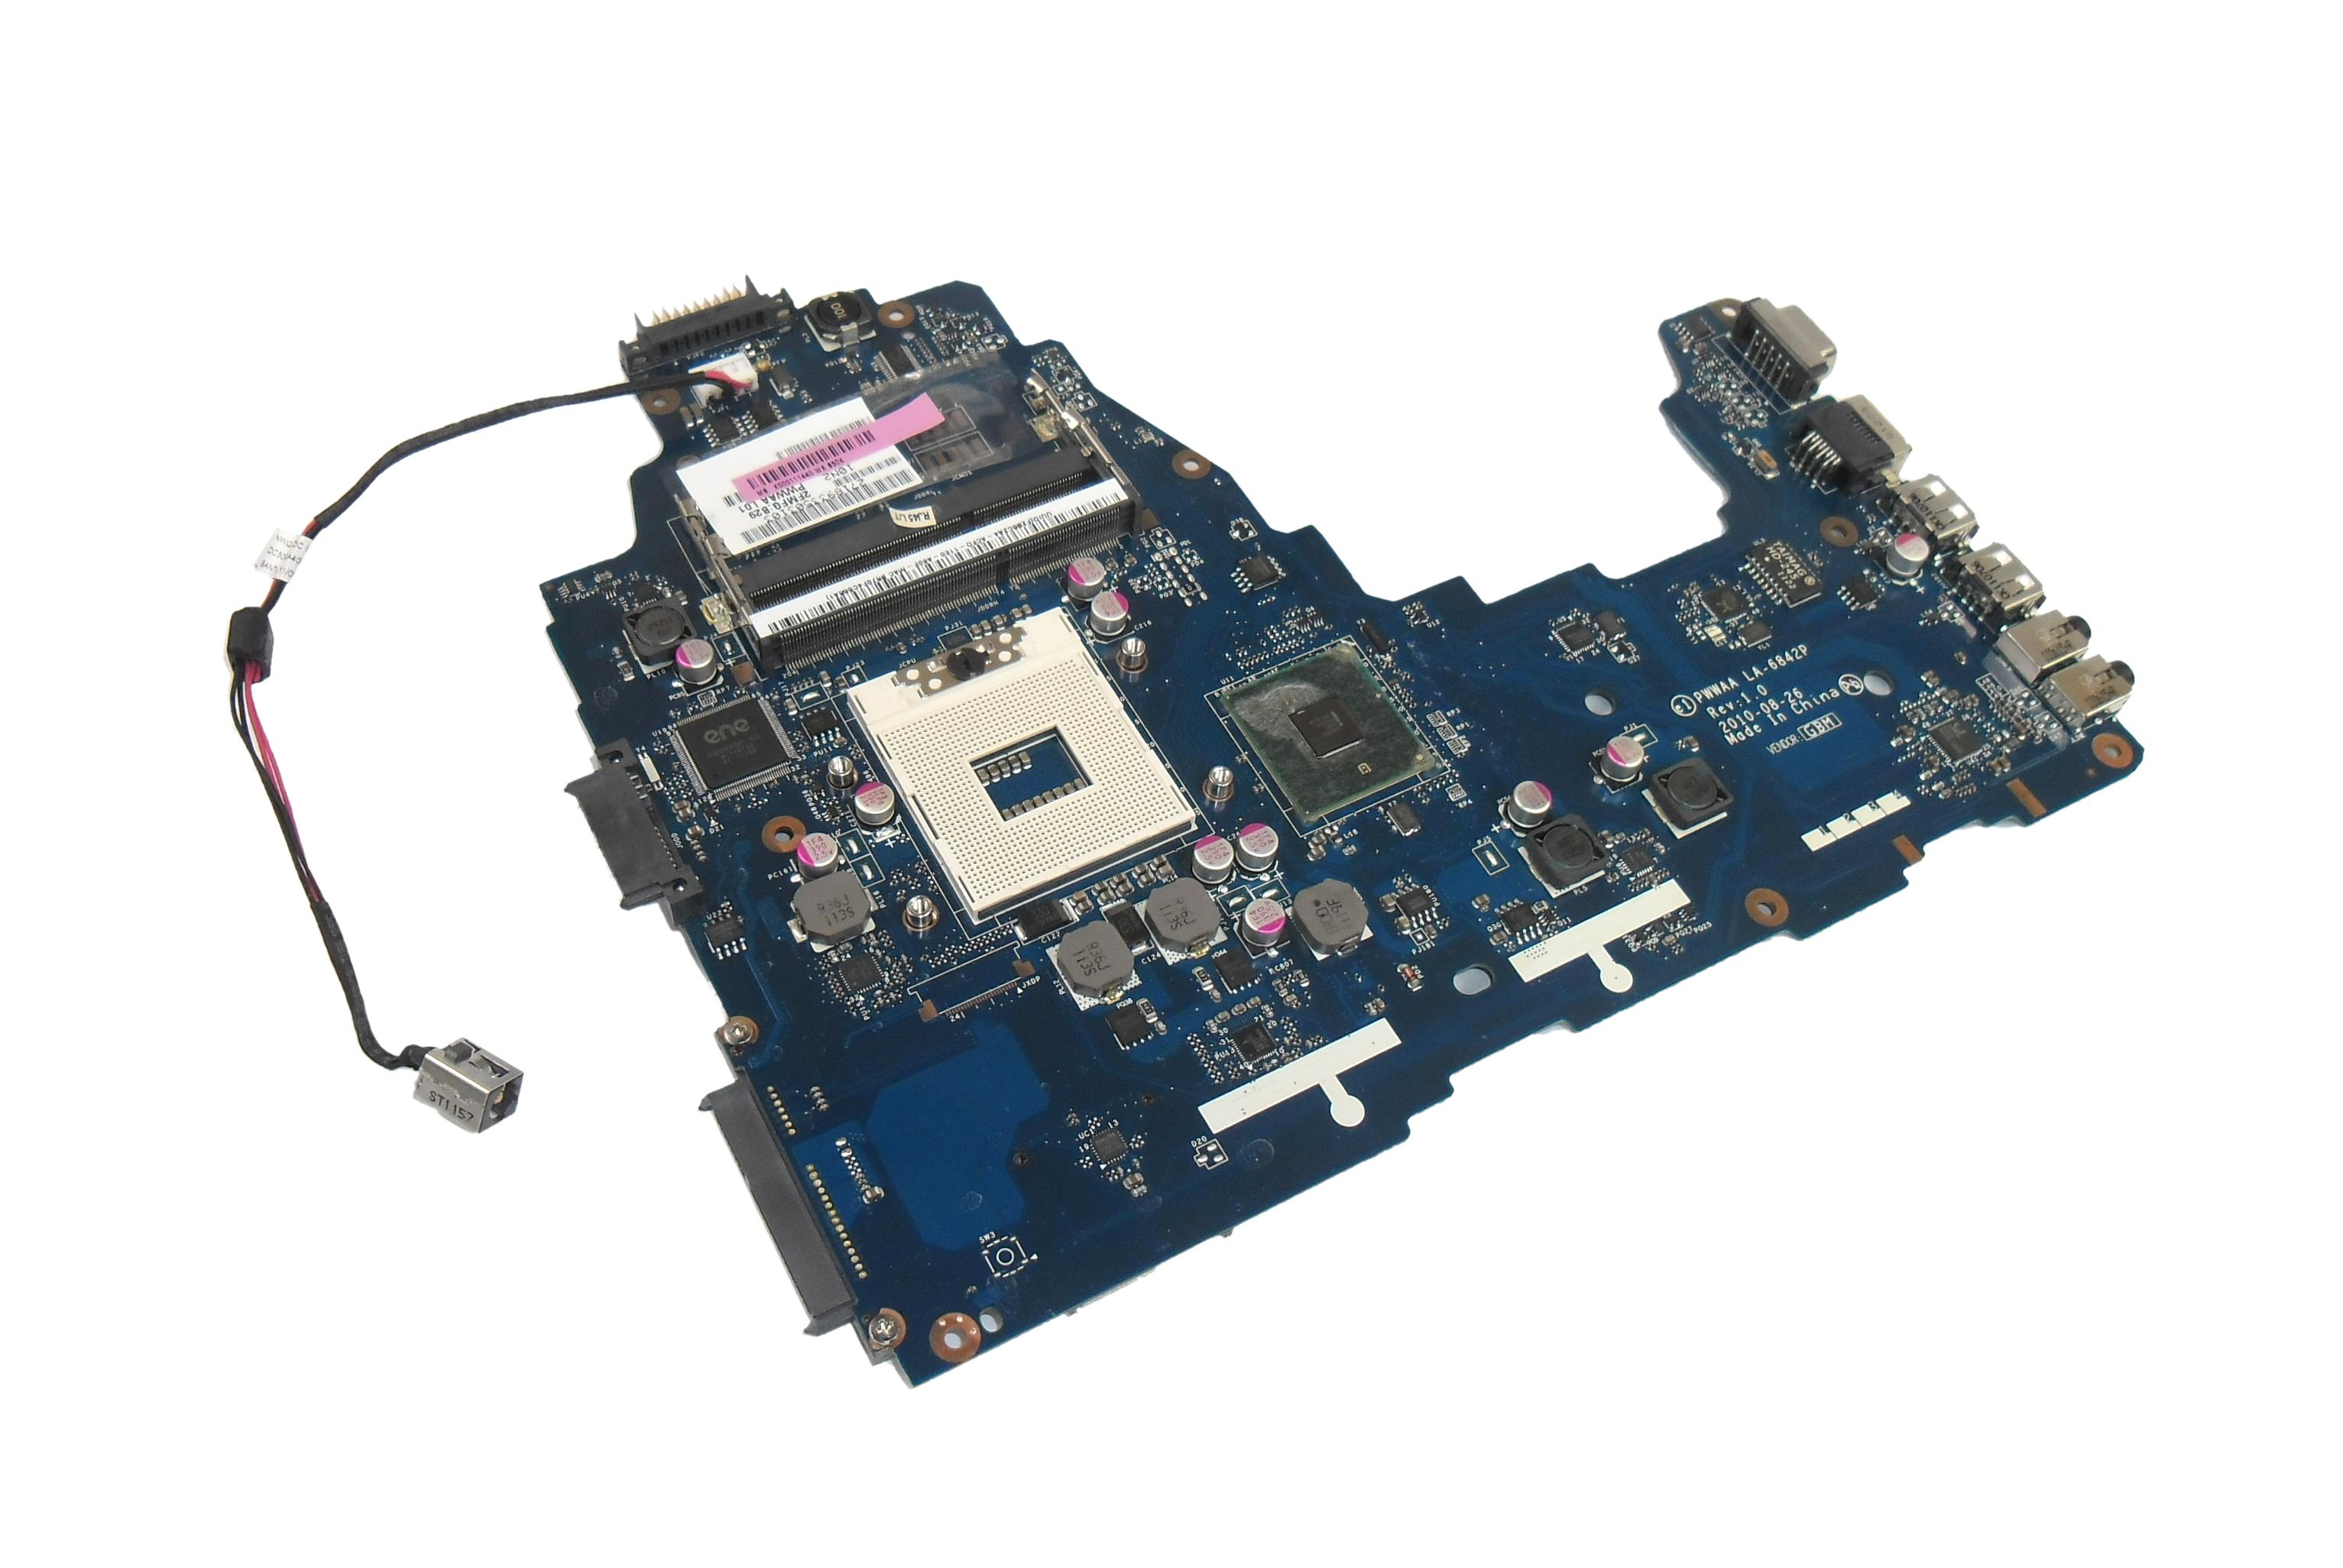 Toshiba K000111440 Satellite Pro C660-219 Laptop Motherboard - LA-6842P